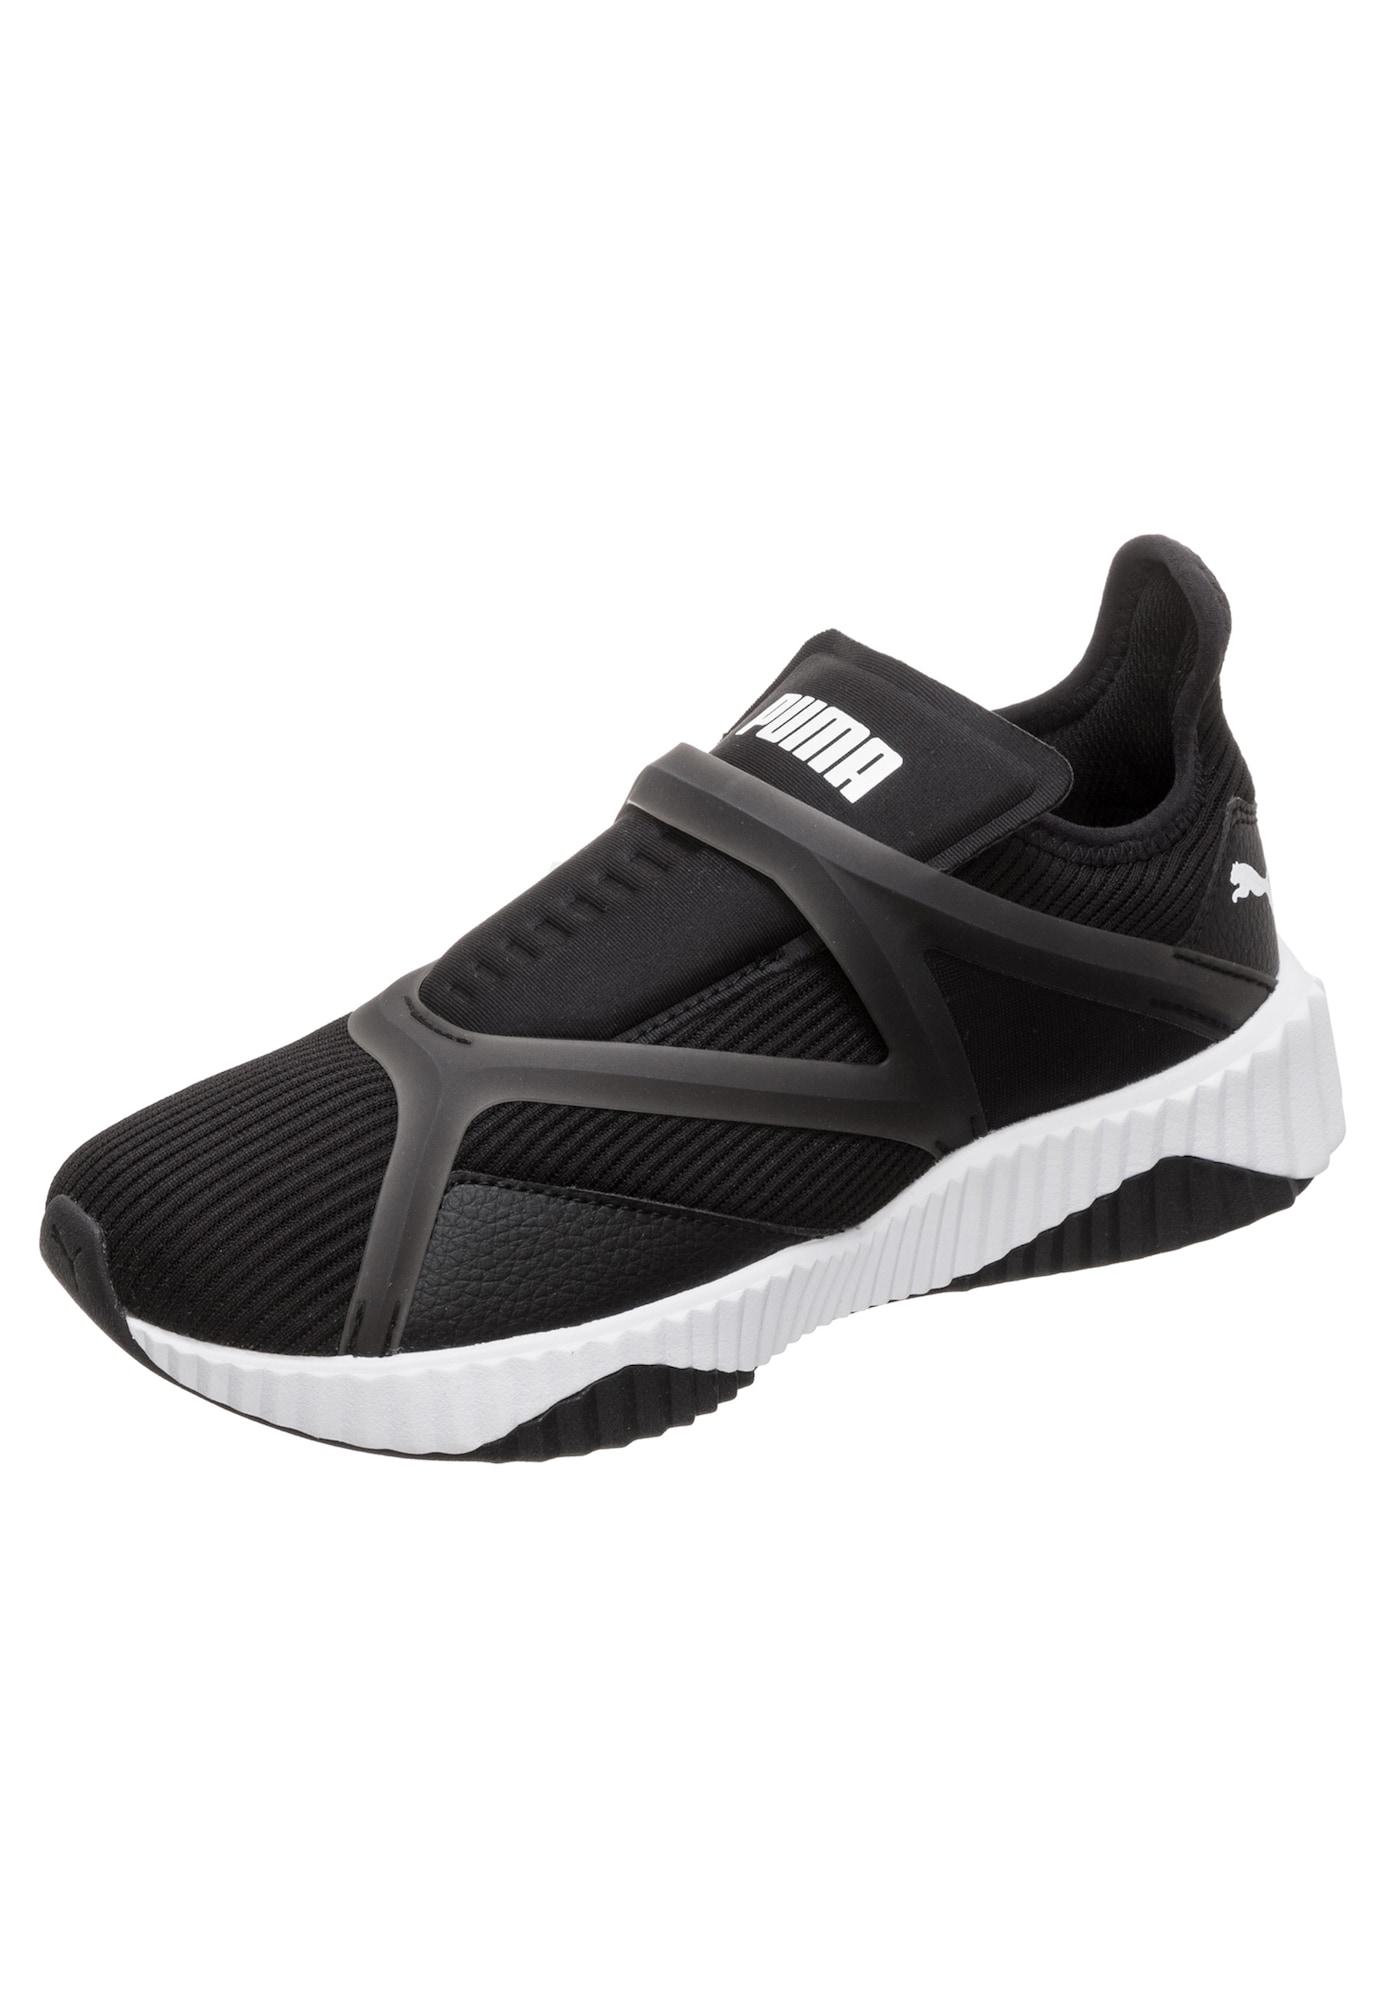 PUMA, Dames Sneakers laag 'Defy Cage', zwart / wit